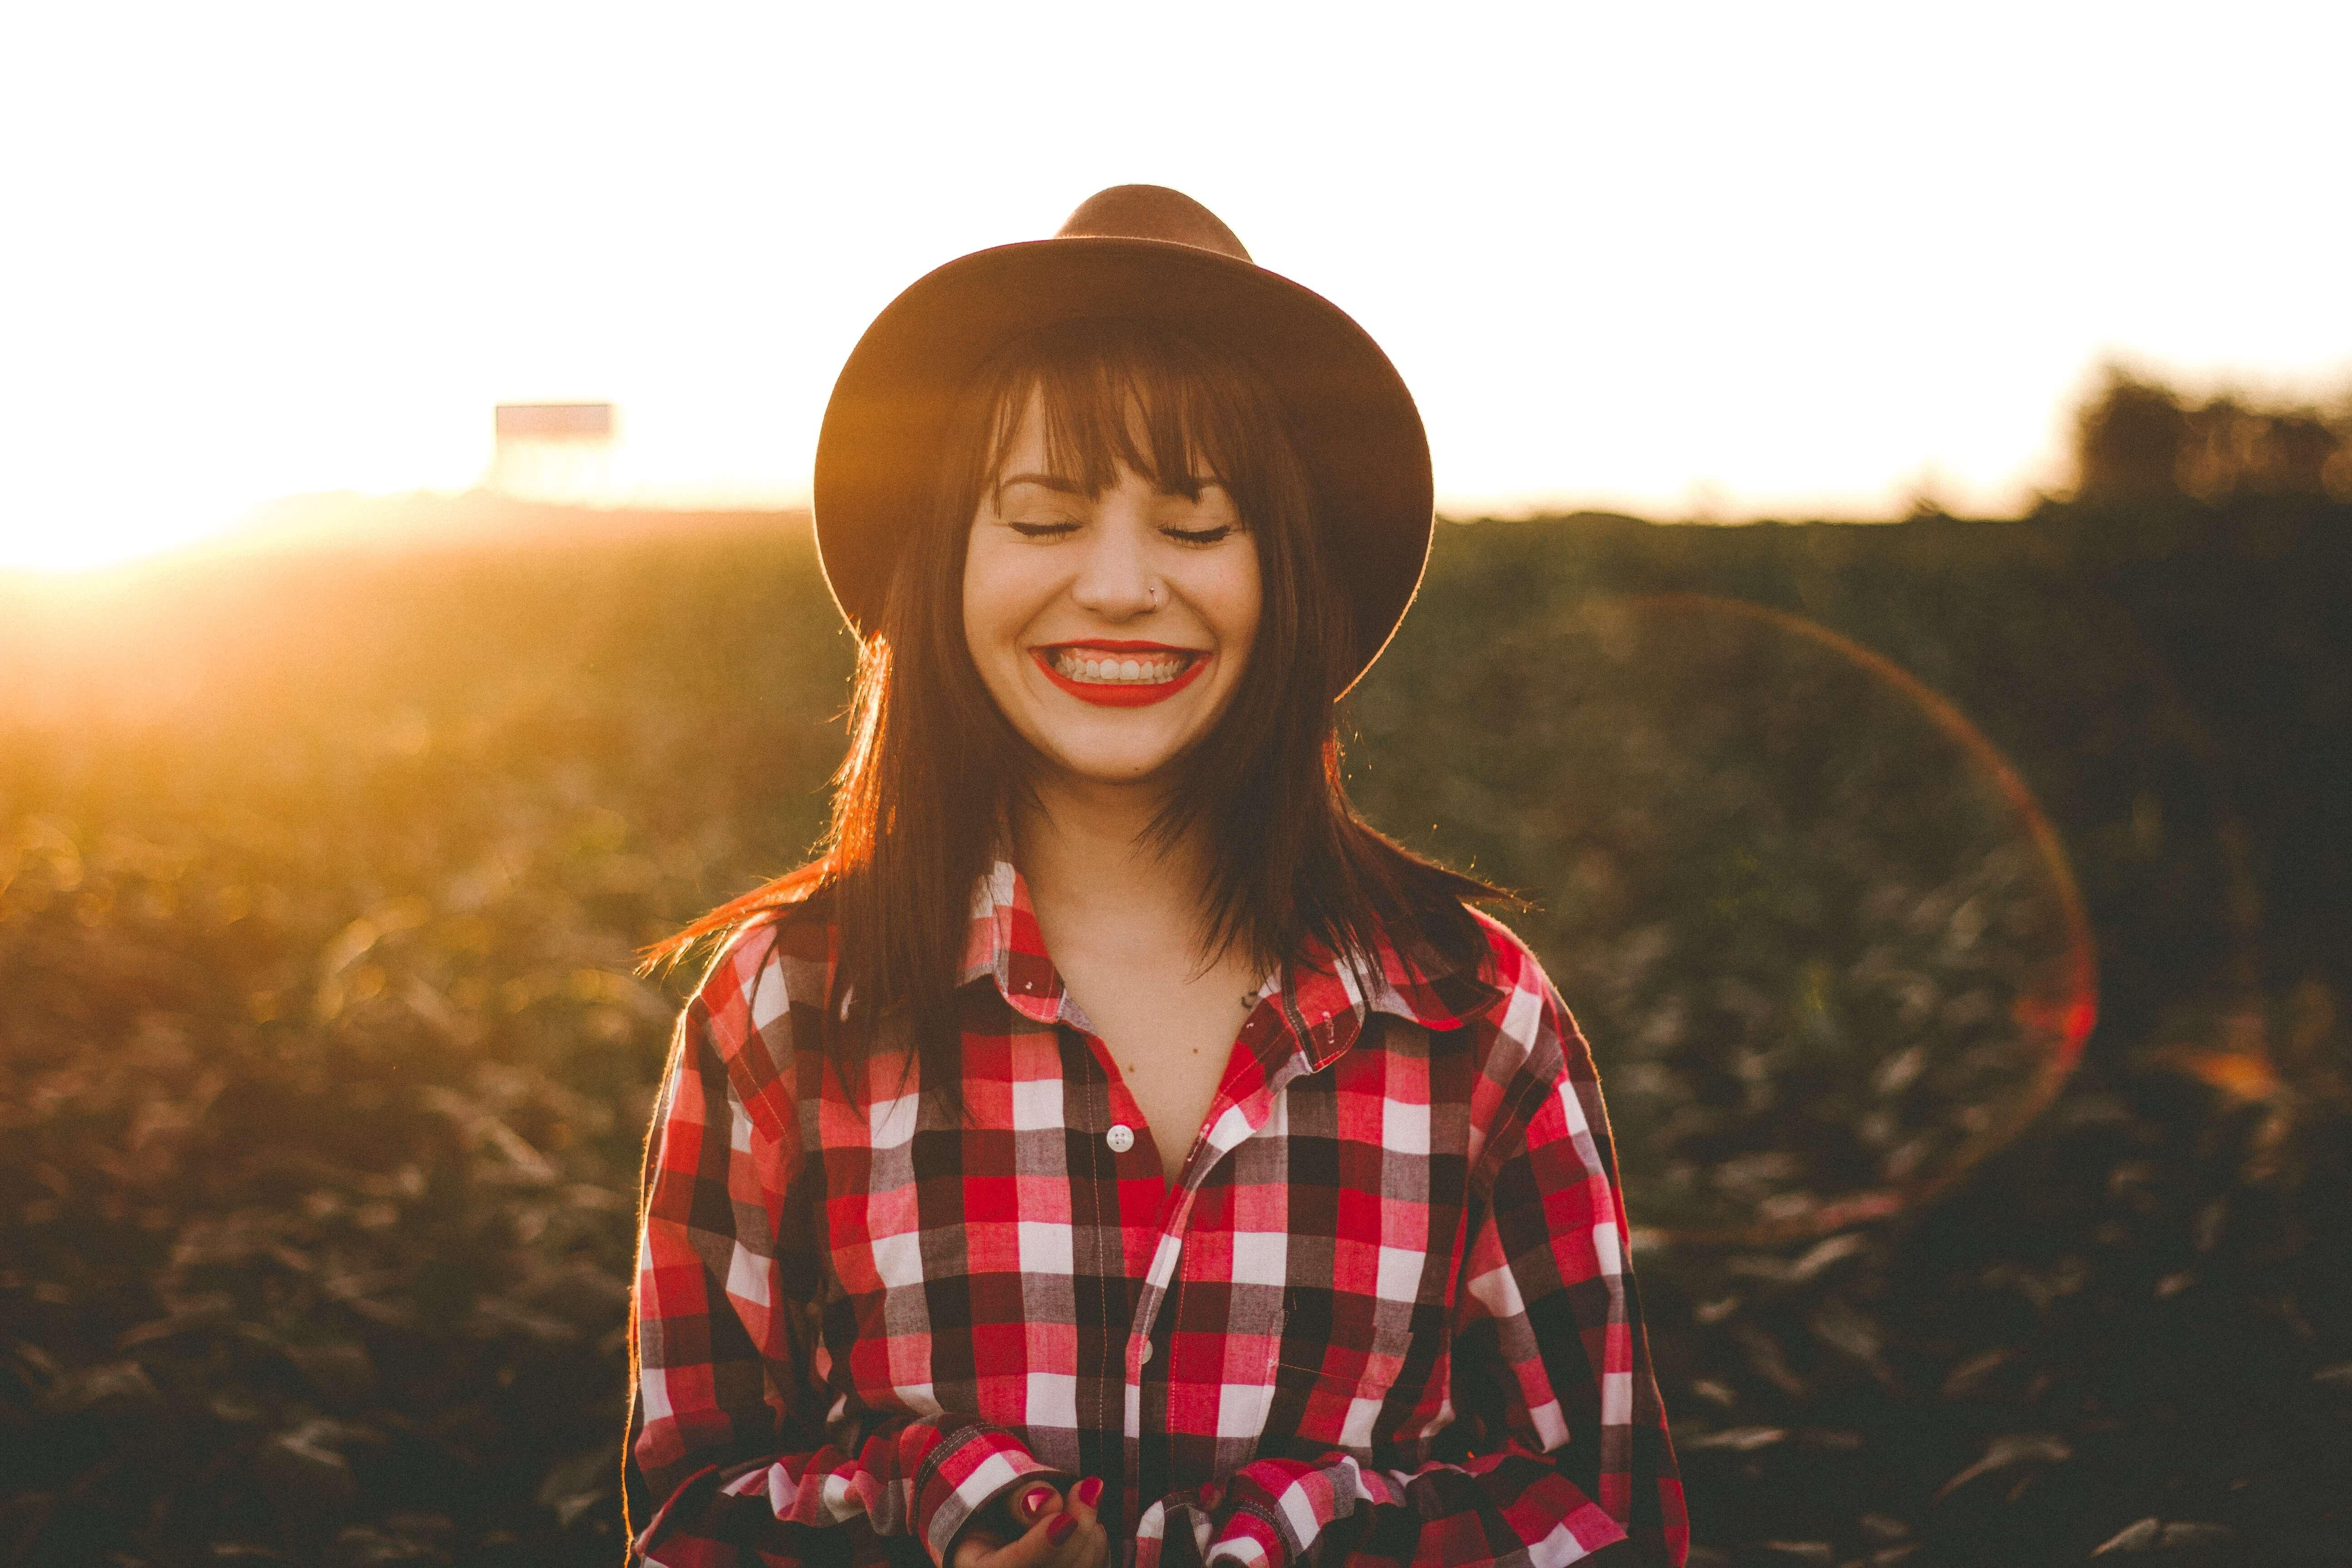 Happy women smiling wearing brown hat